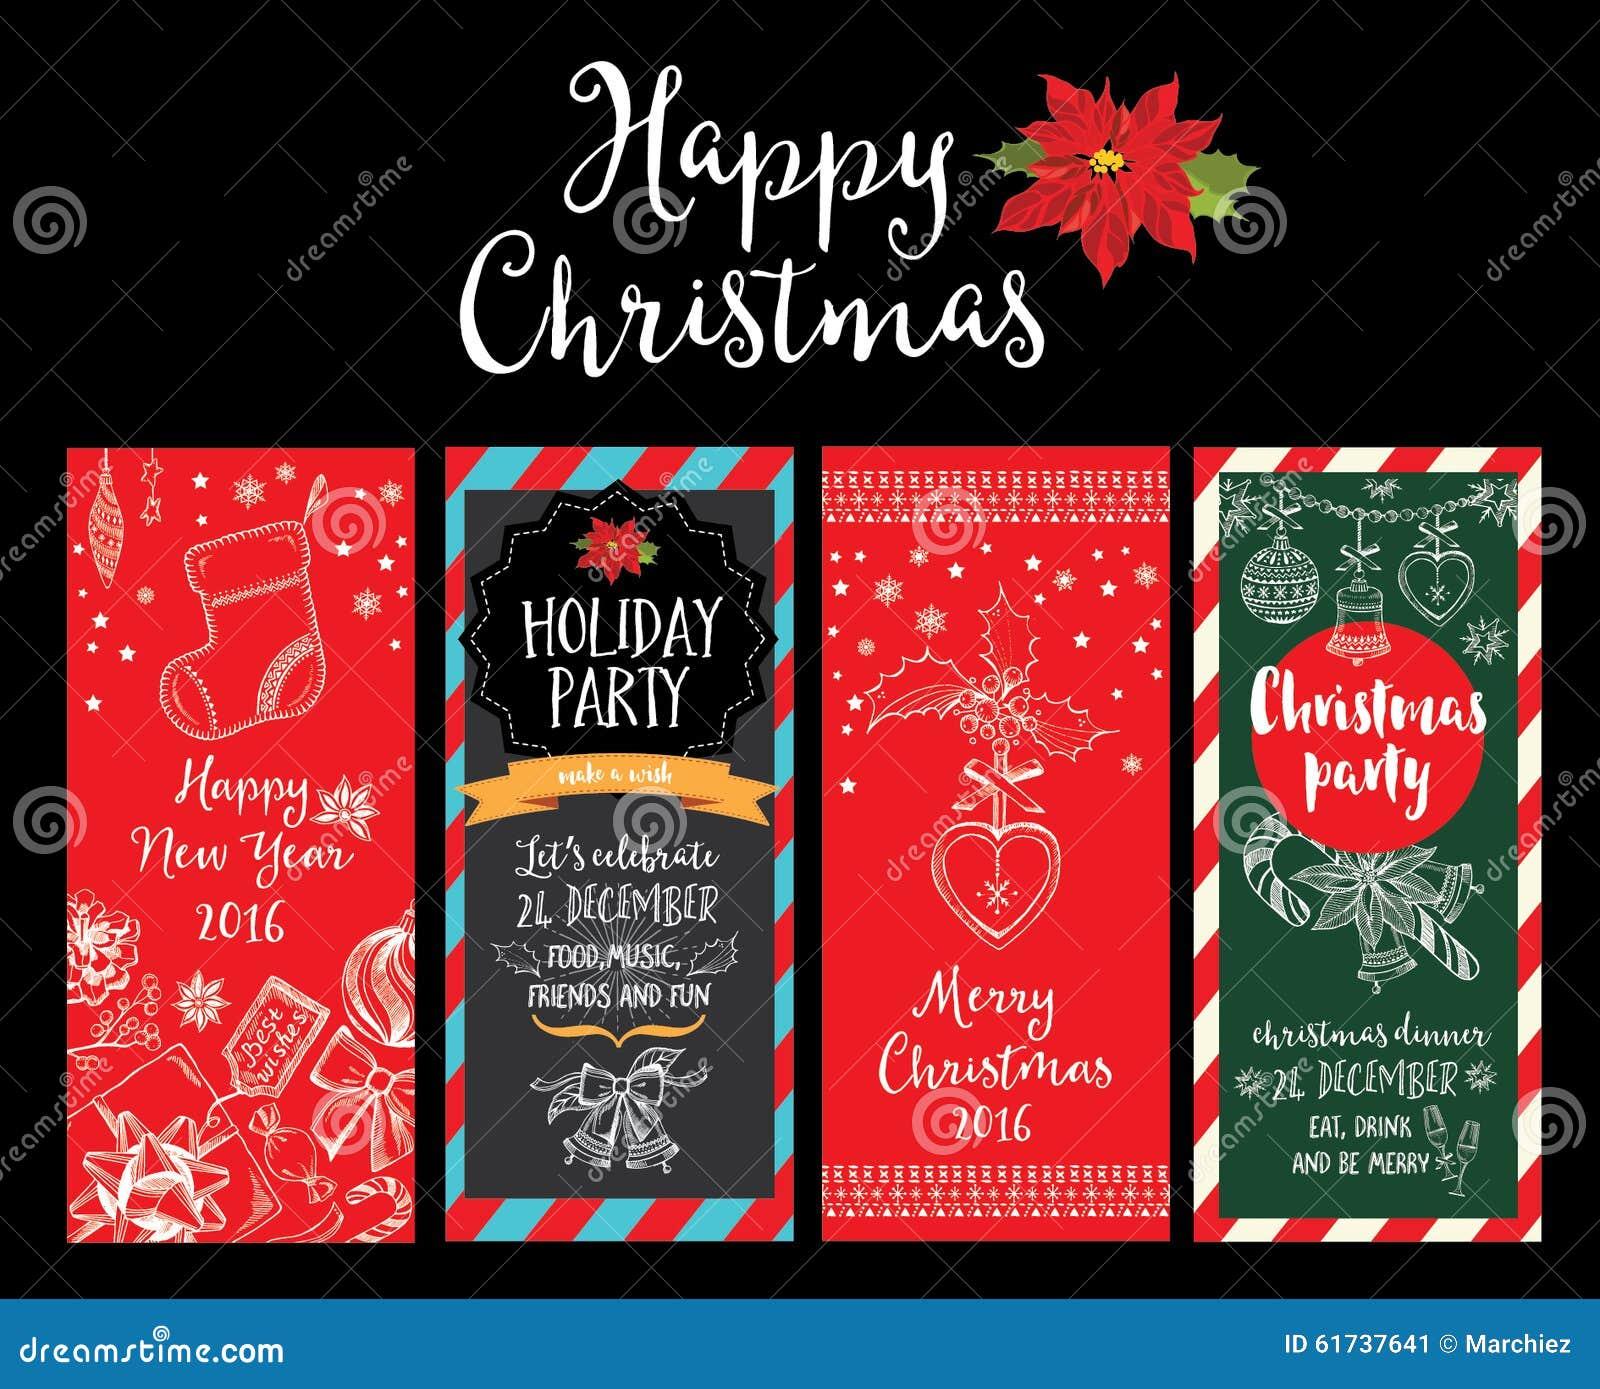 Christmas Party Invitation. Holiday Card. Stock Vector